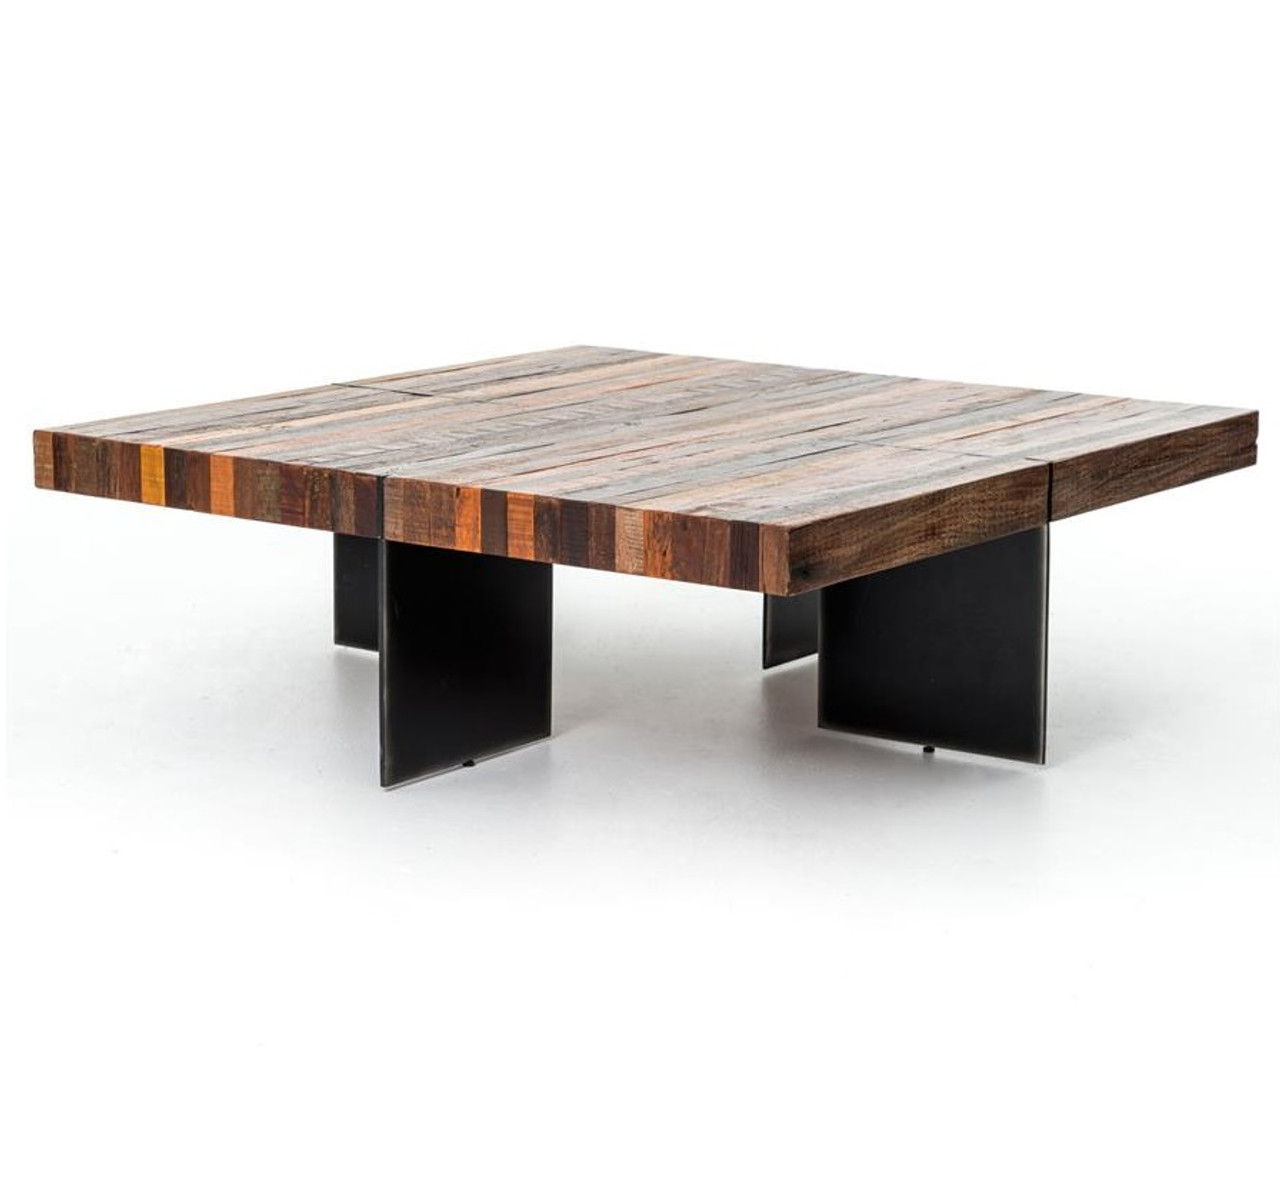 Bina Alec Industrial Rustic Square Coffee Table Zin Home